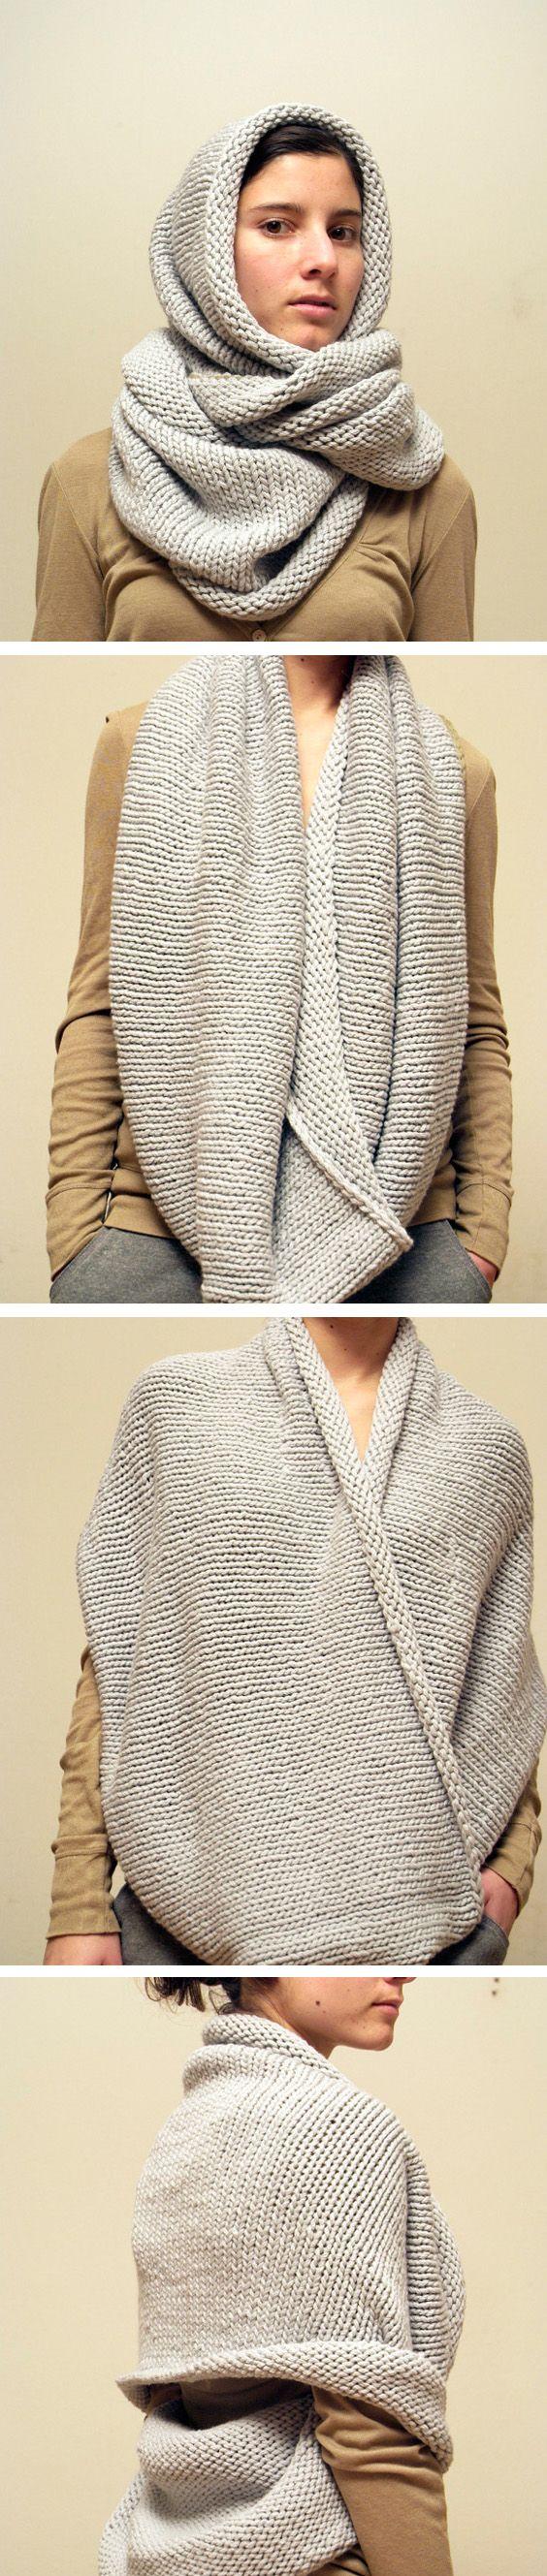 Elementum by Daniela Pais...brilliant, simple design